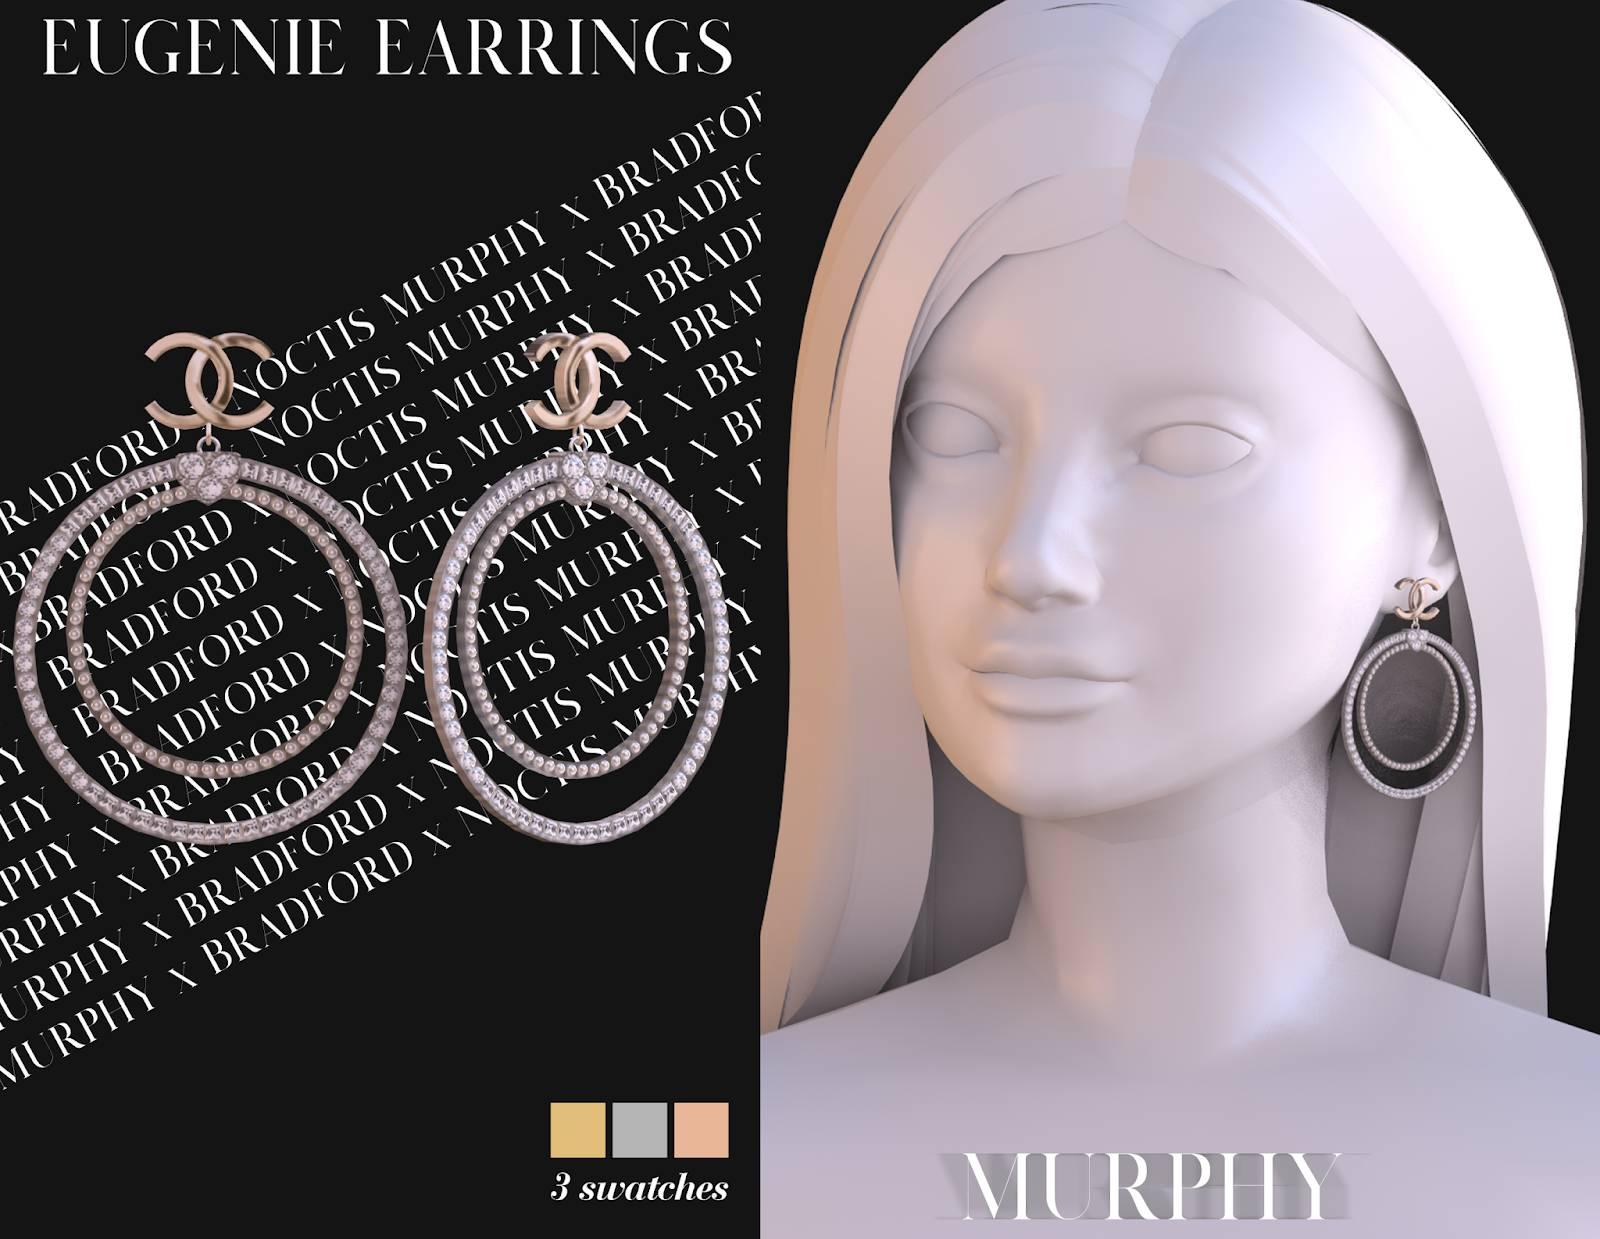 Серьги - EUGENIE EARRINGS